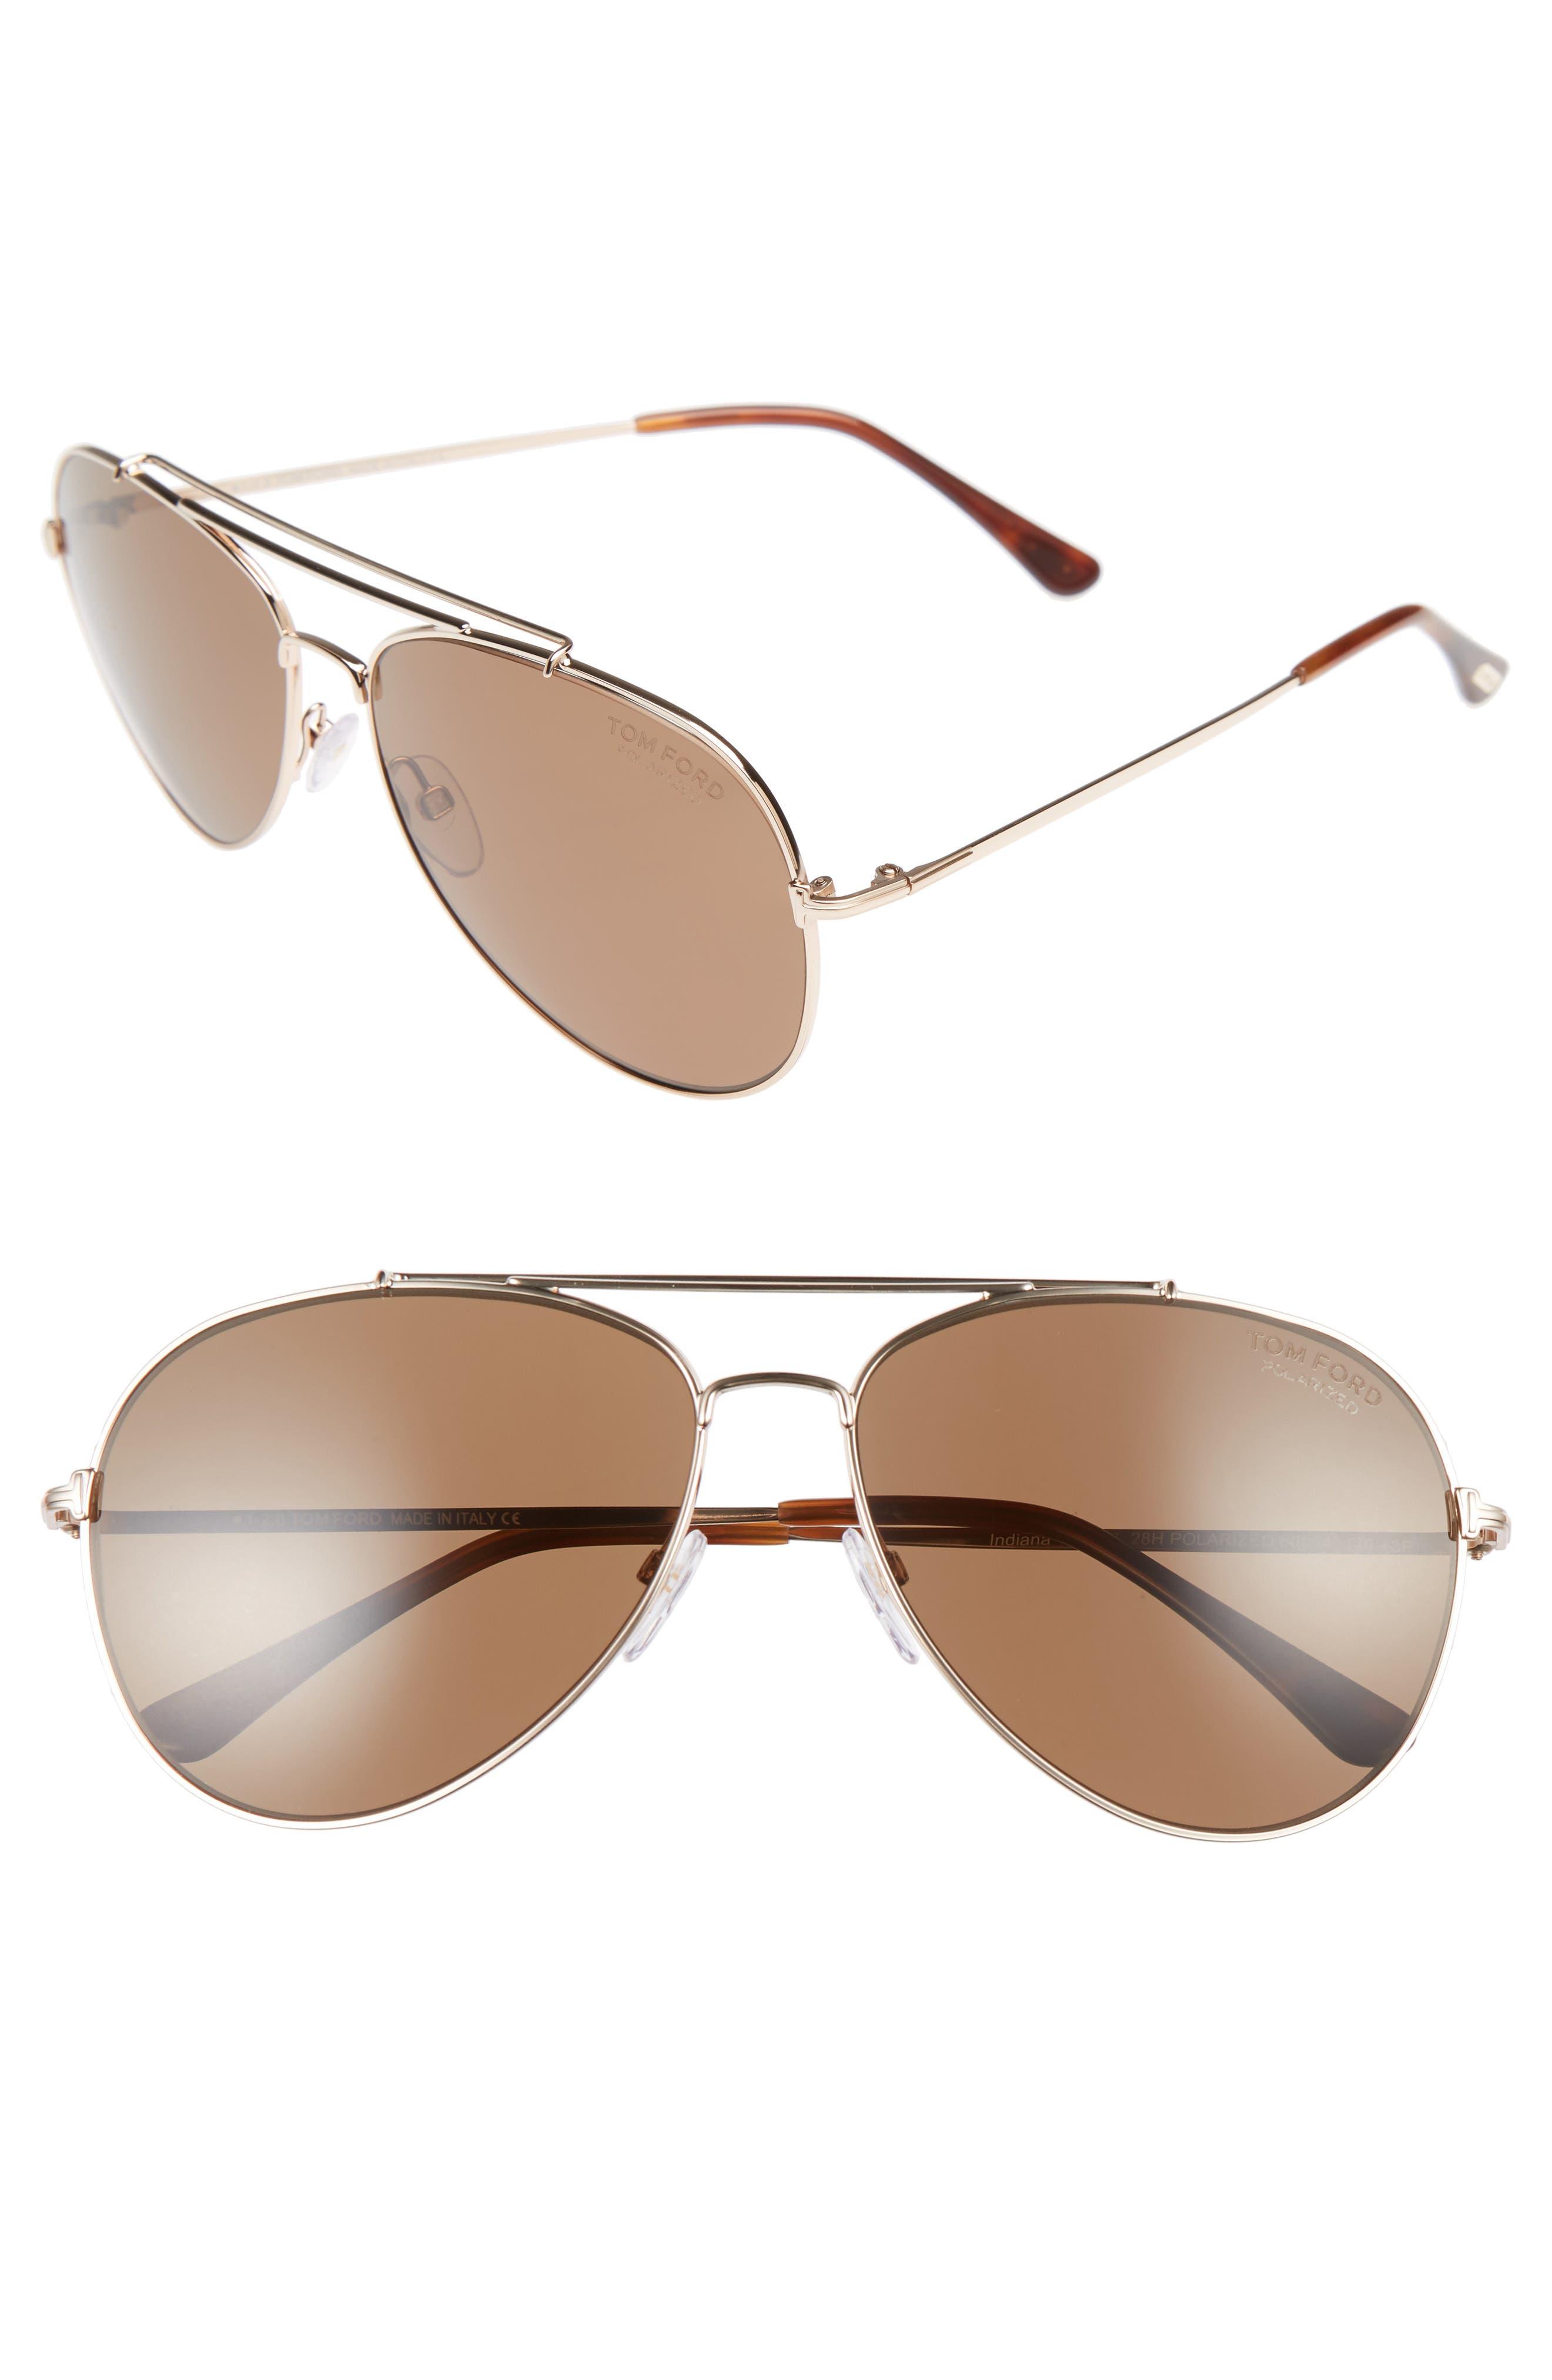 Main Image - Tom Ford Indiana 60mm Polarized Aviator Sunglasses